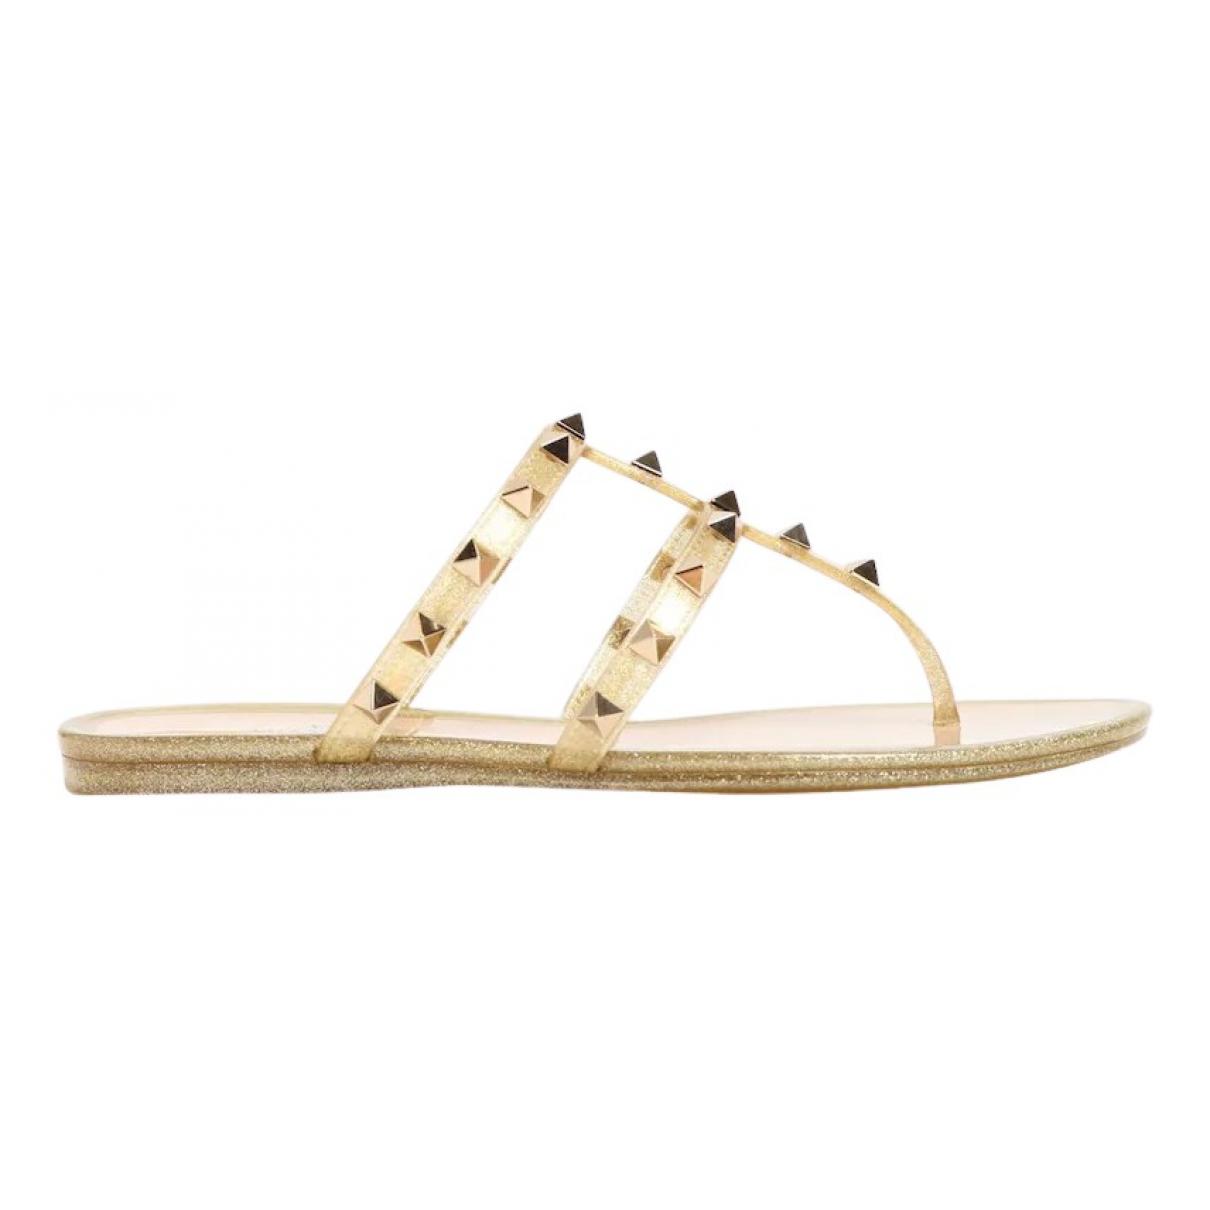 Valentino Garavani Rockstud Gold Leather Sandals for Women 37 EU